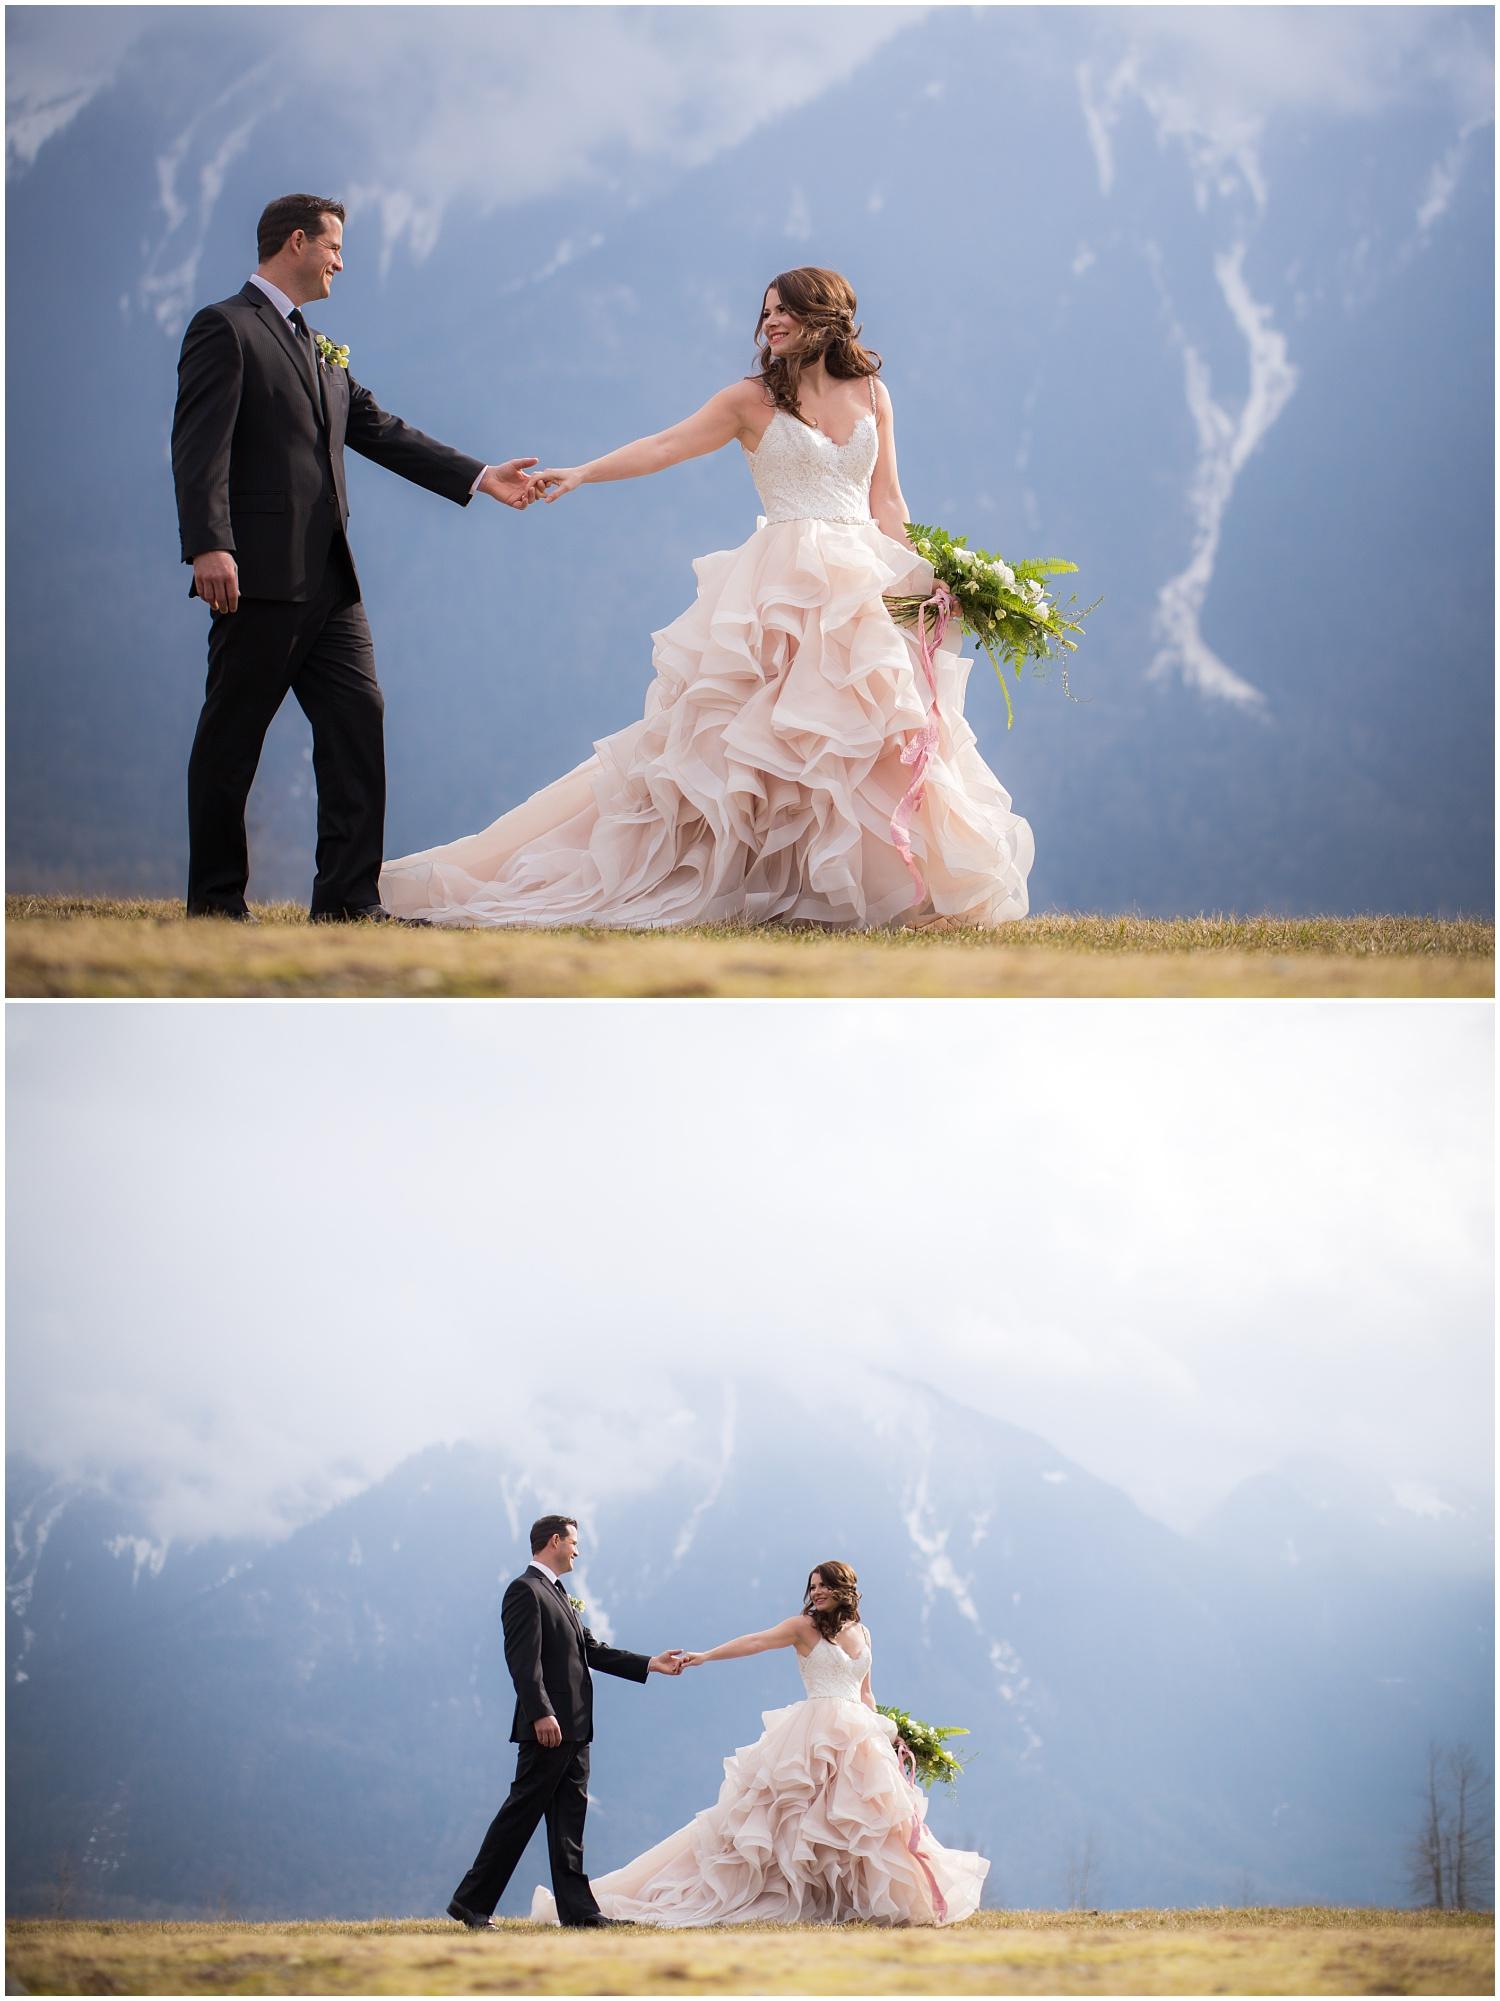 Amazing Day Photography - Fraser River Lodge Styled Session - Woodland Wedding - Green Tones - Green and White Wedding - Blush Wedding Dress - Morilee Wedding Dress - BC Wedding (46).jpg